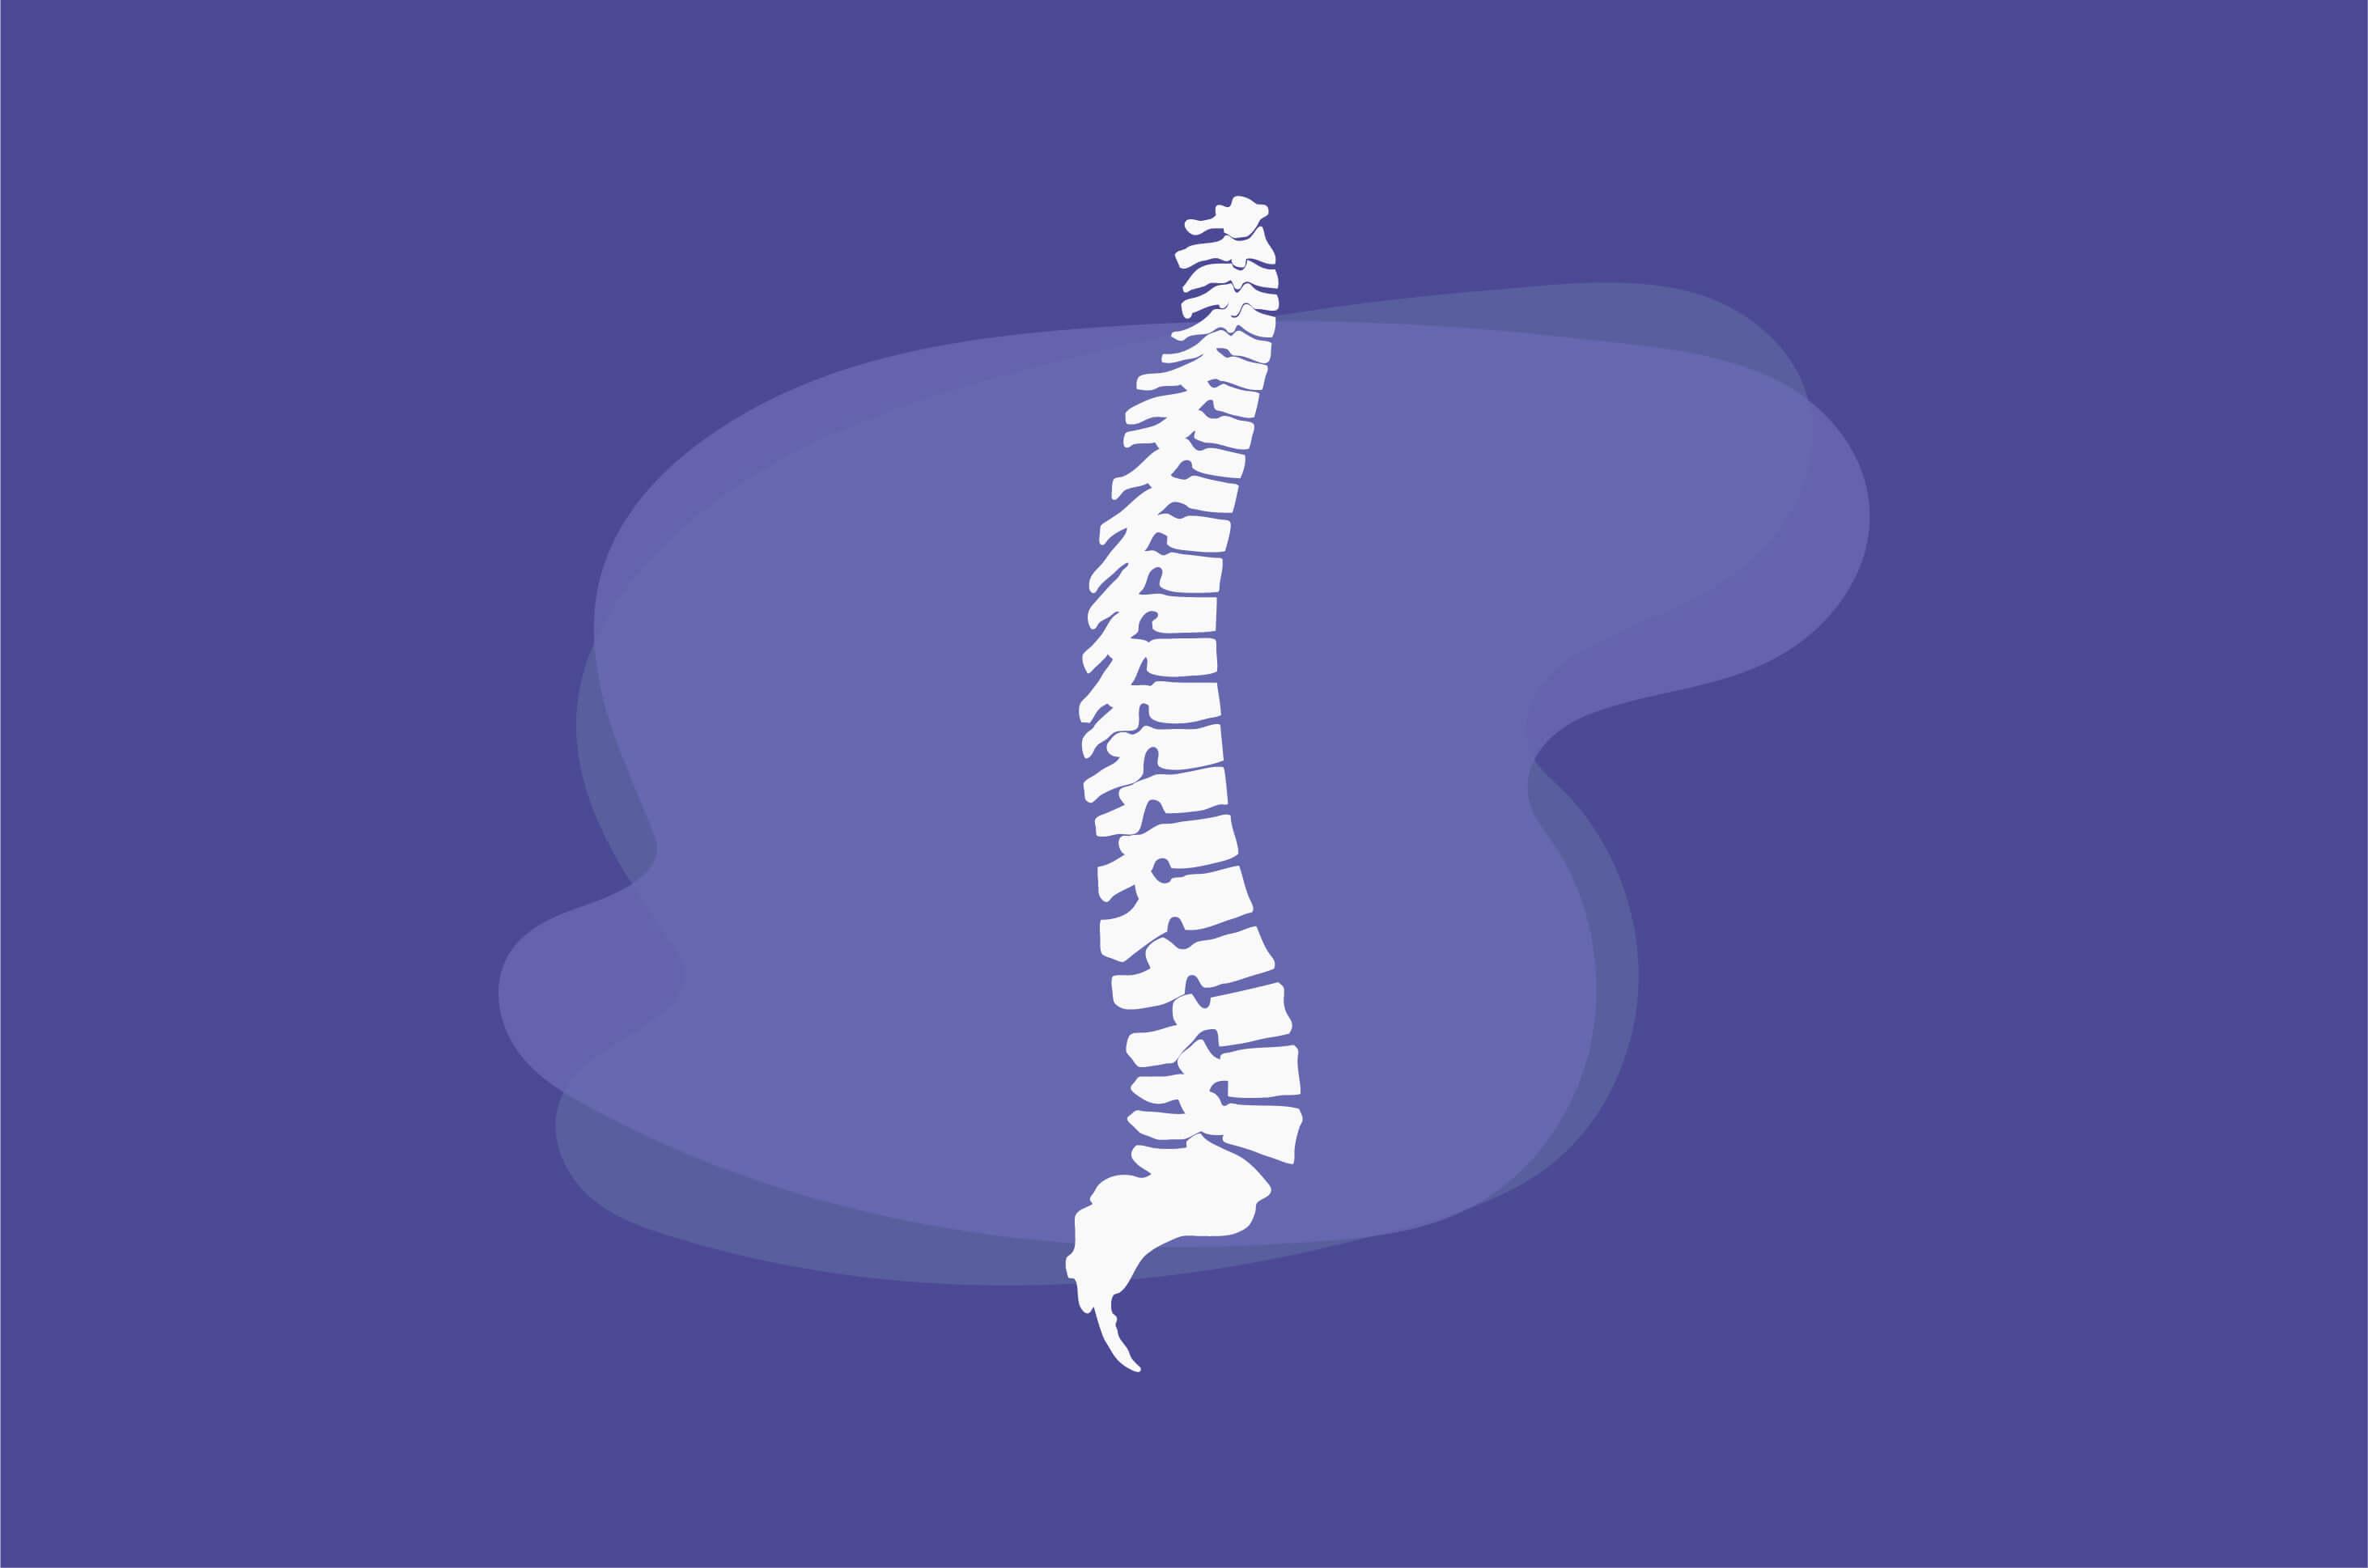 Kenali Spondylosis, Penyakit yang Menyerang Tulang Belakang